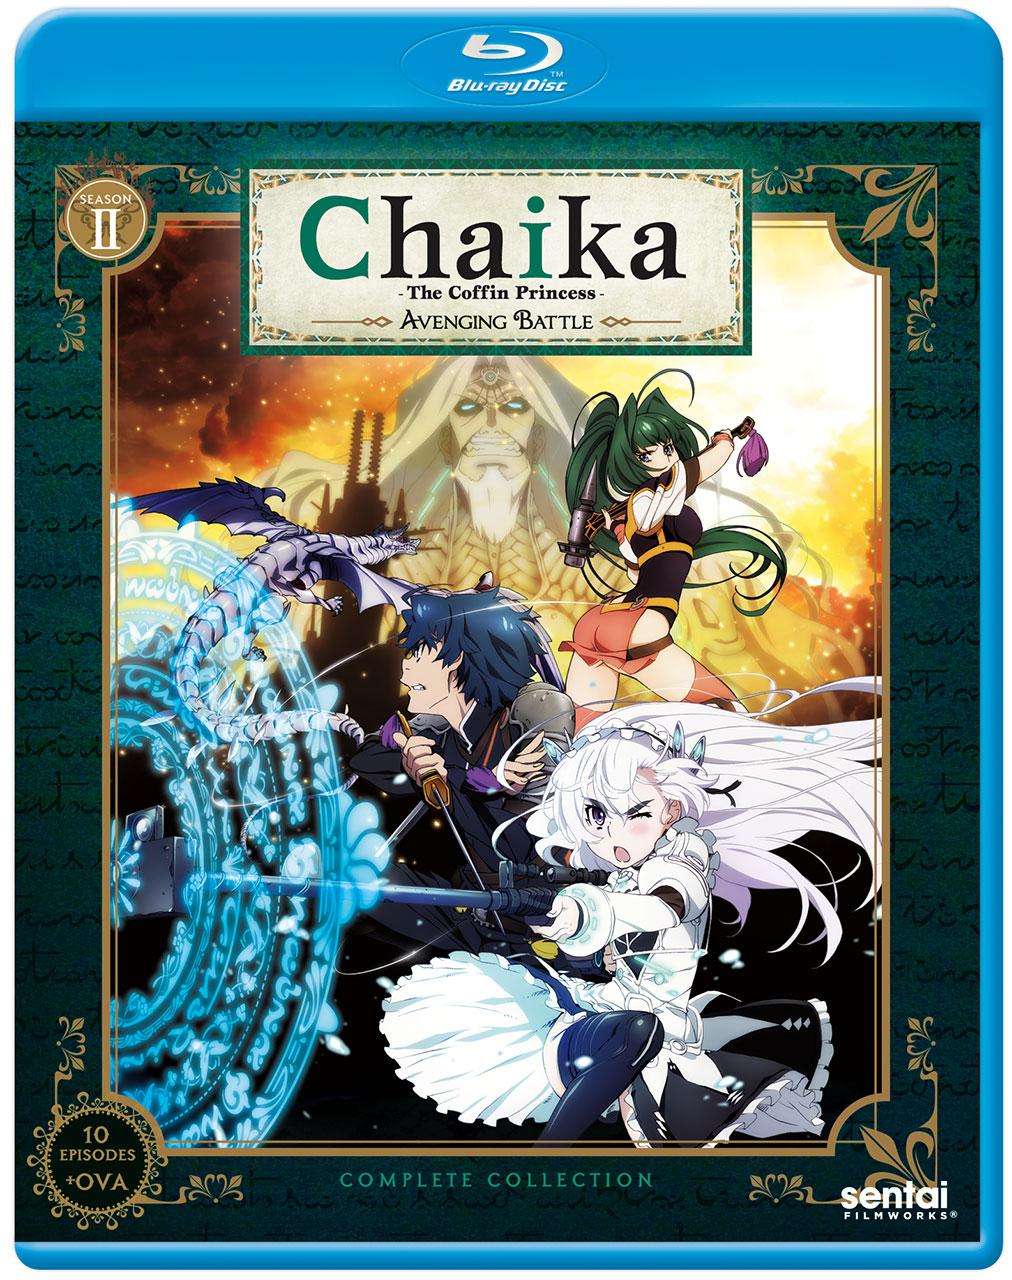 Chaika the Coffin Princess Avenging Battle (Season 2) Blu-ray